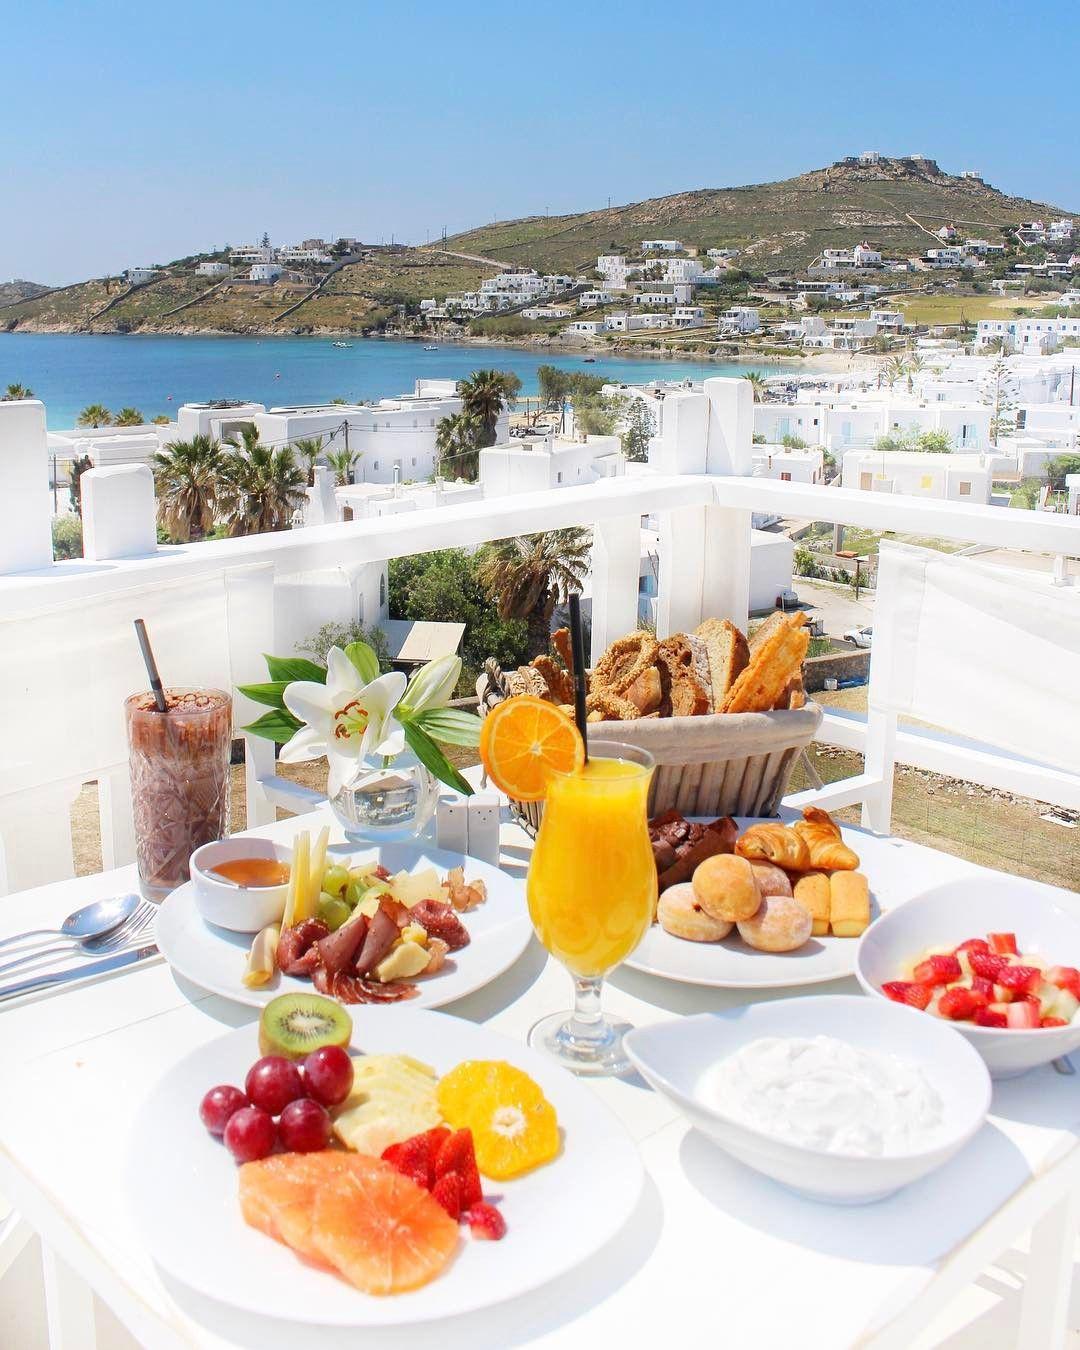 Garden By The Bay Breakfast kali órexi / bon appétit! from @kenshomykonos